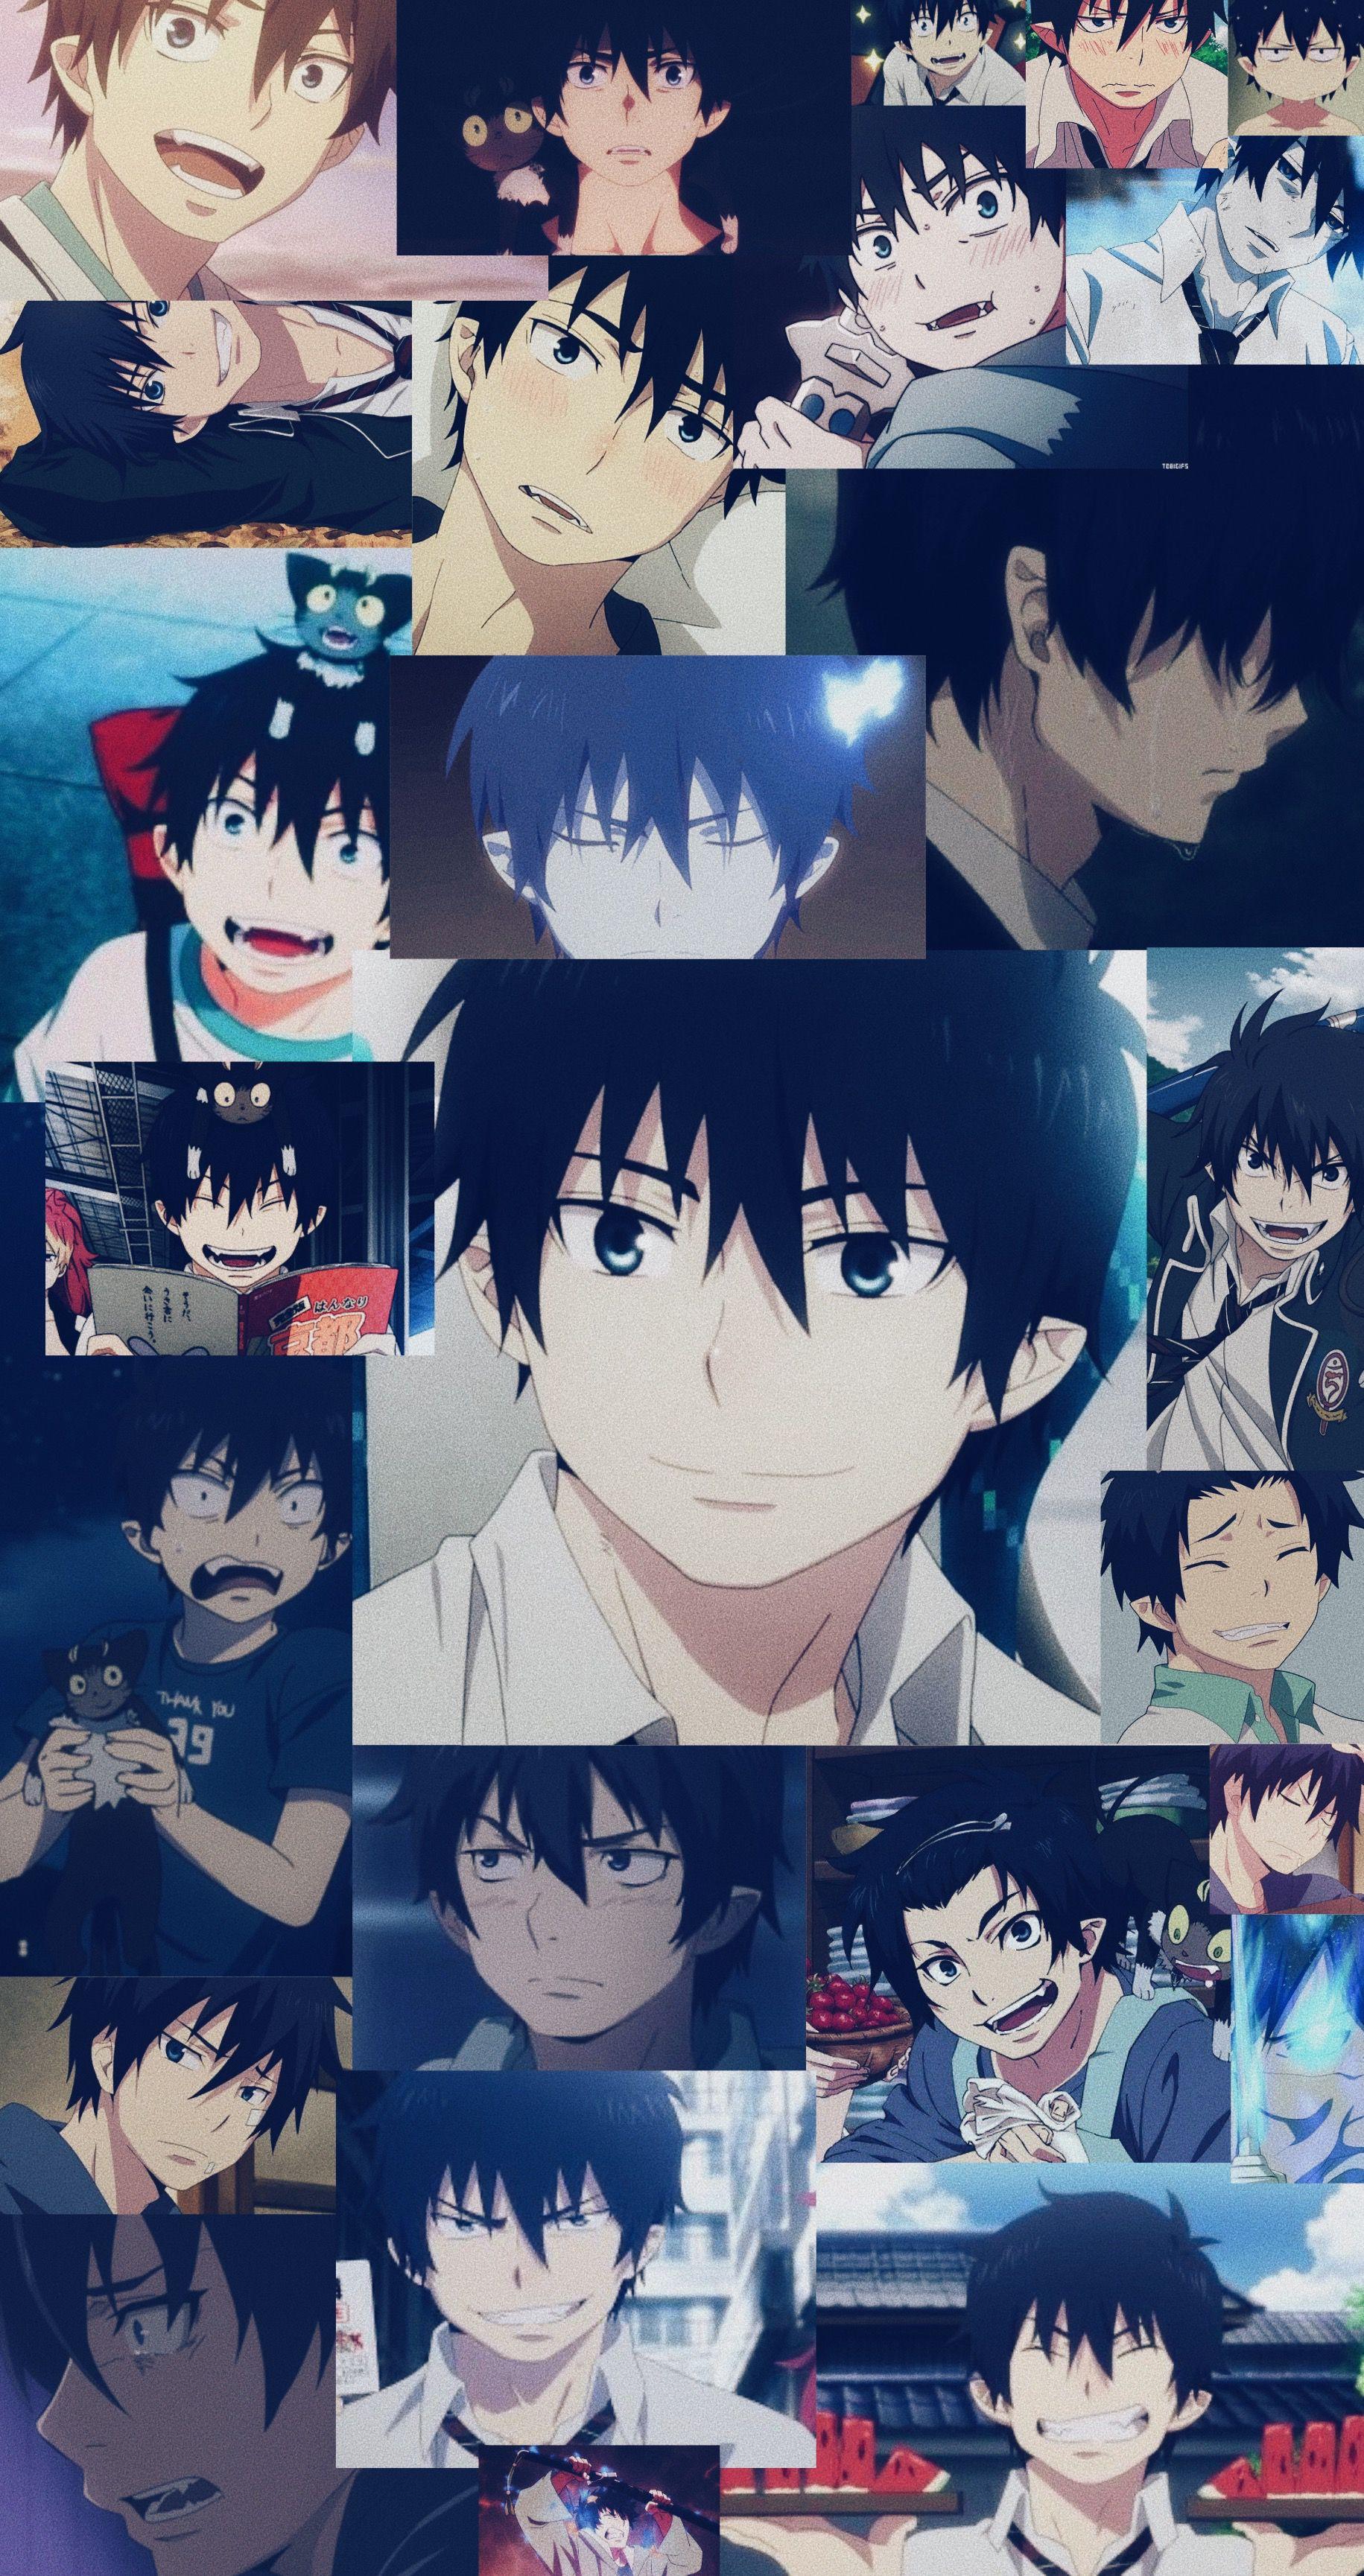 Okumura Rin Blue Exorcist Rin Blue Exorcist Anime Exorcist Anime